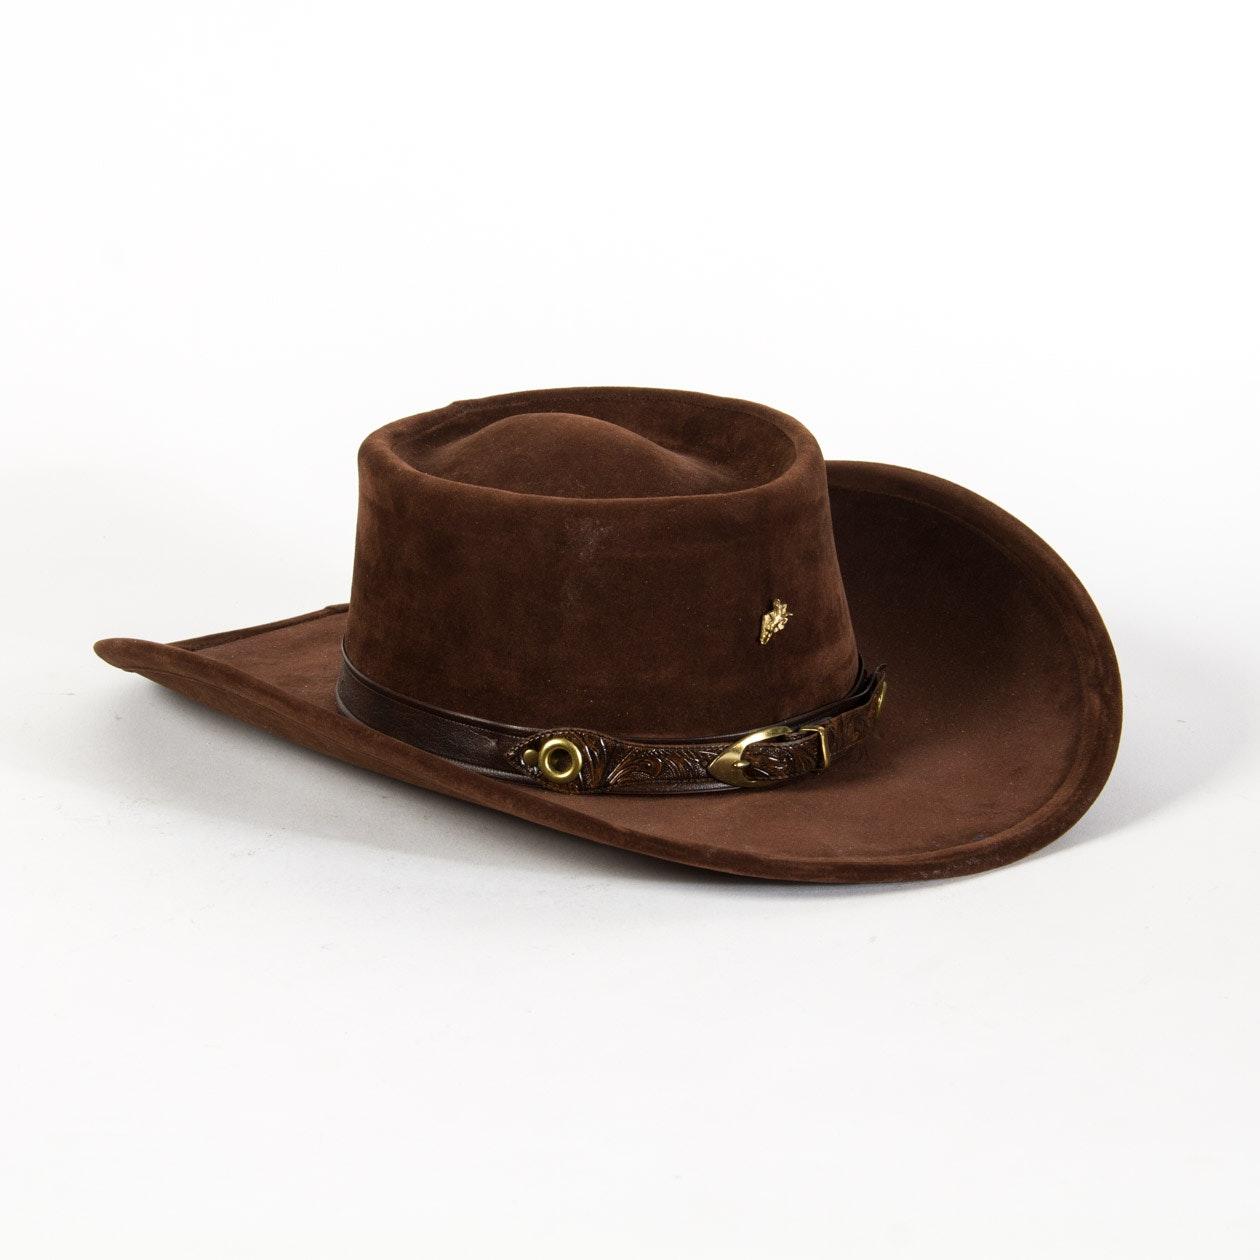 Bailey U-Rollit Vintage Cowboy Hat